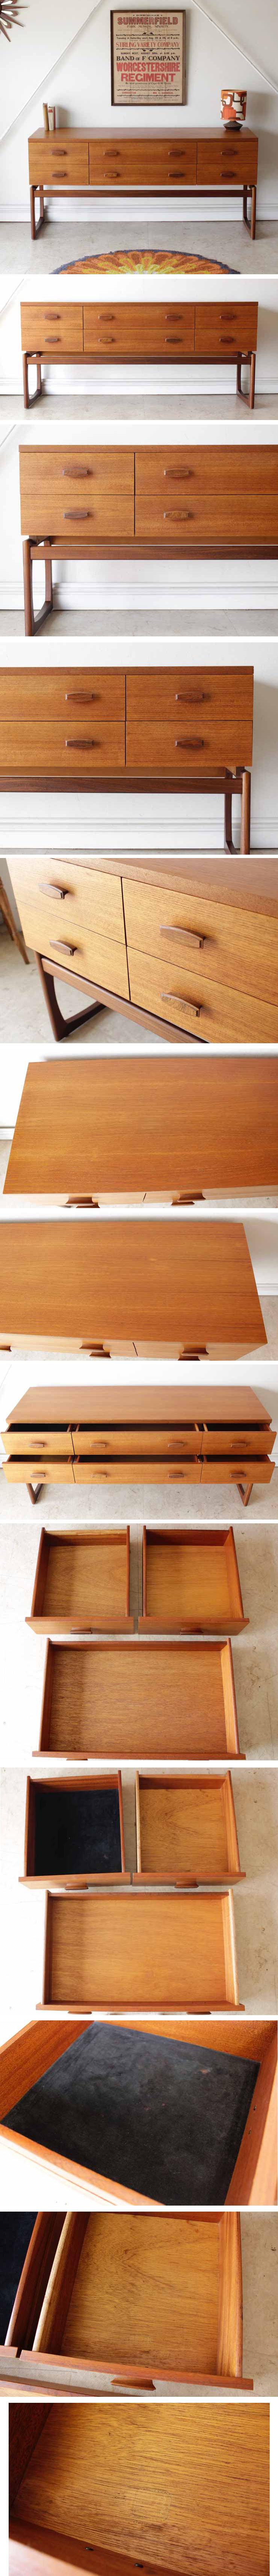 G-plan・ジープラン・サイドボード・チェスト・ビンテージ・チーク・北欧家具